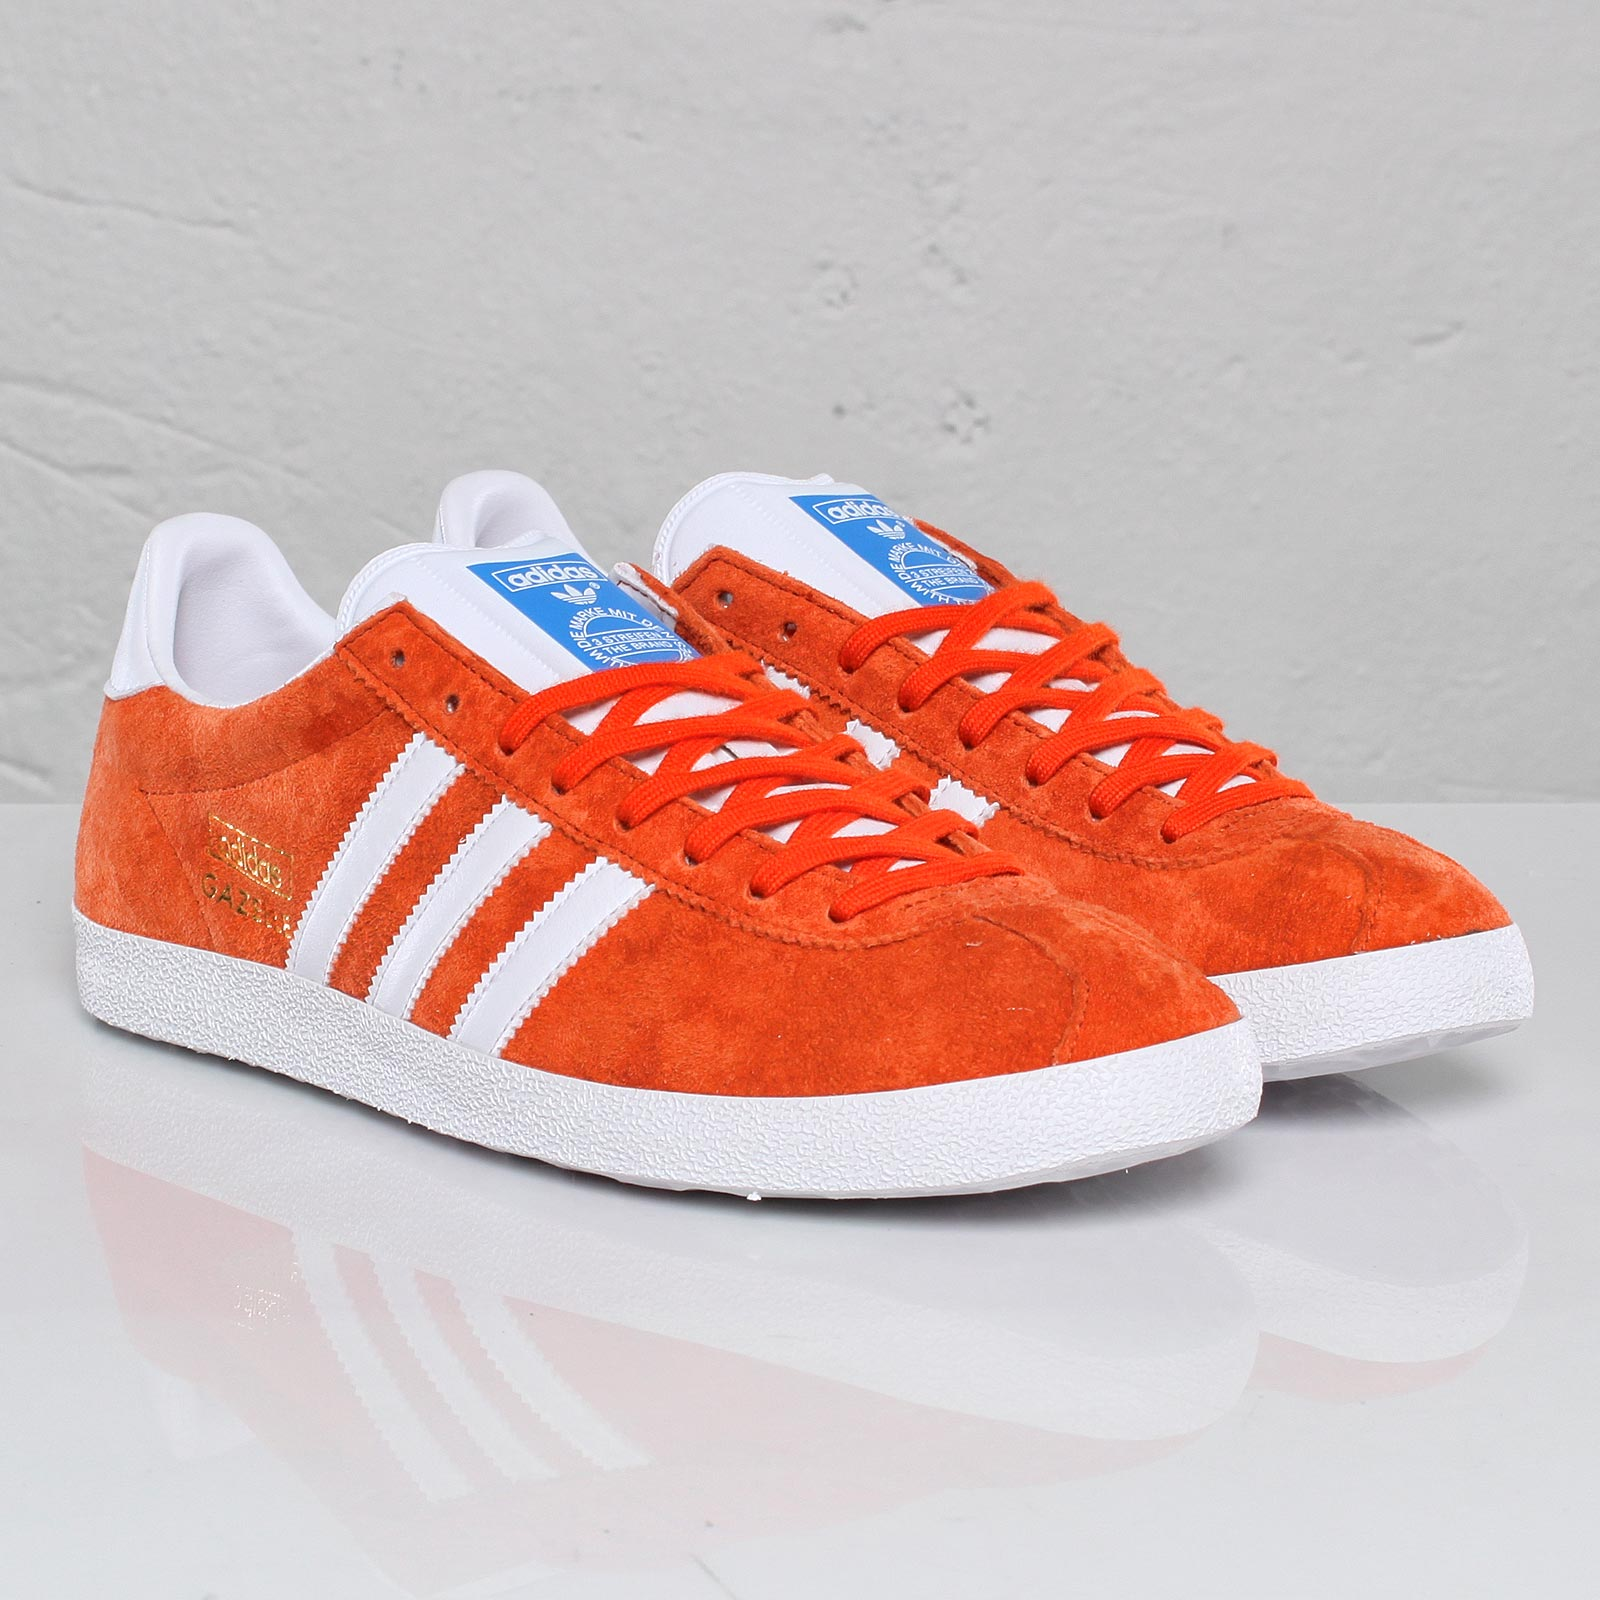 adidas Gazelle OG - 101606 - SNS | sneakers & streetwear online ...